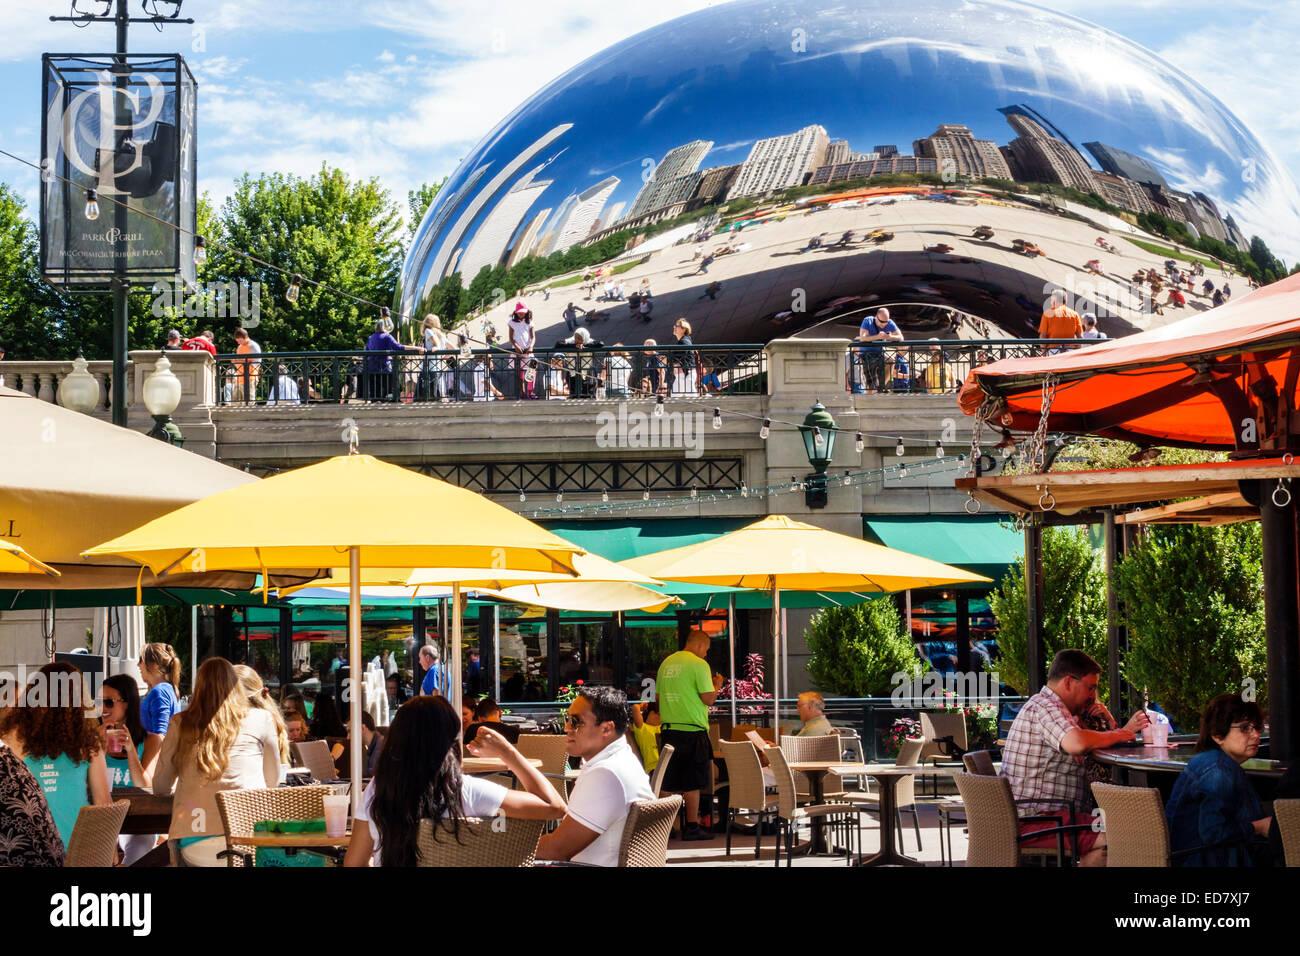 Illinois, Midwest, Chicago, Loop, Millennium Park, Park Grill, restaurantes comida cena comer fuera cafés informales, Foto de stock